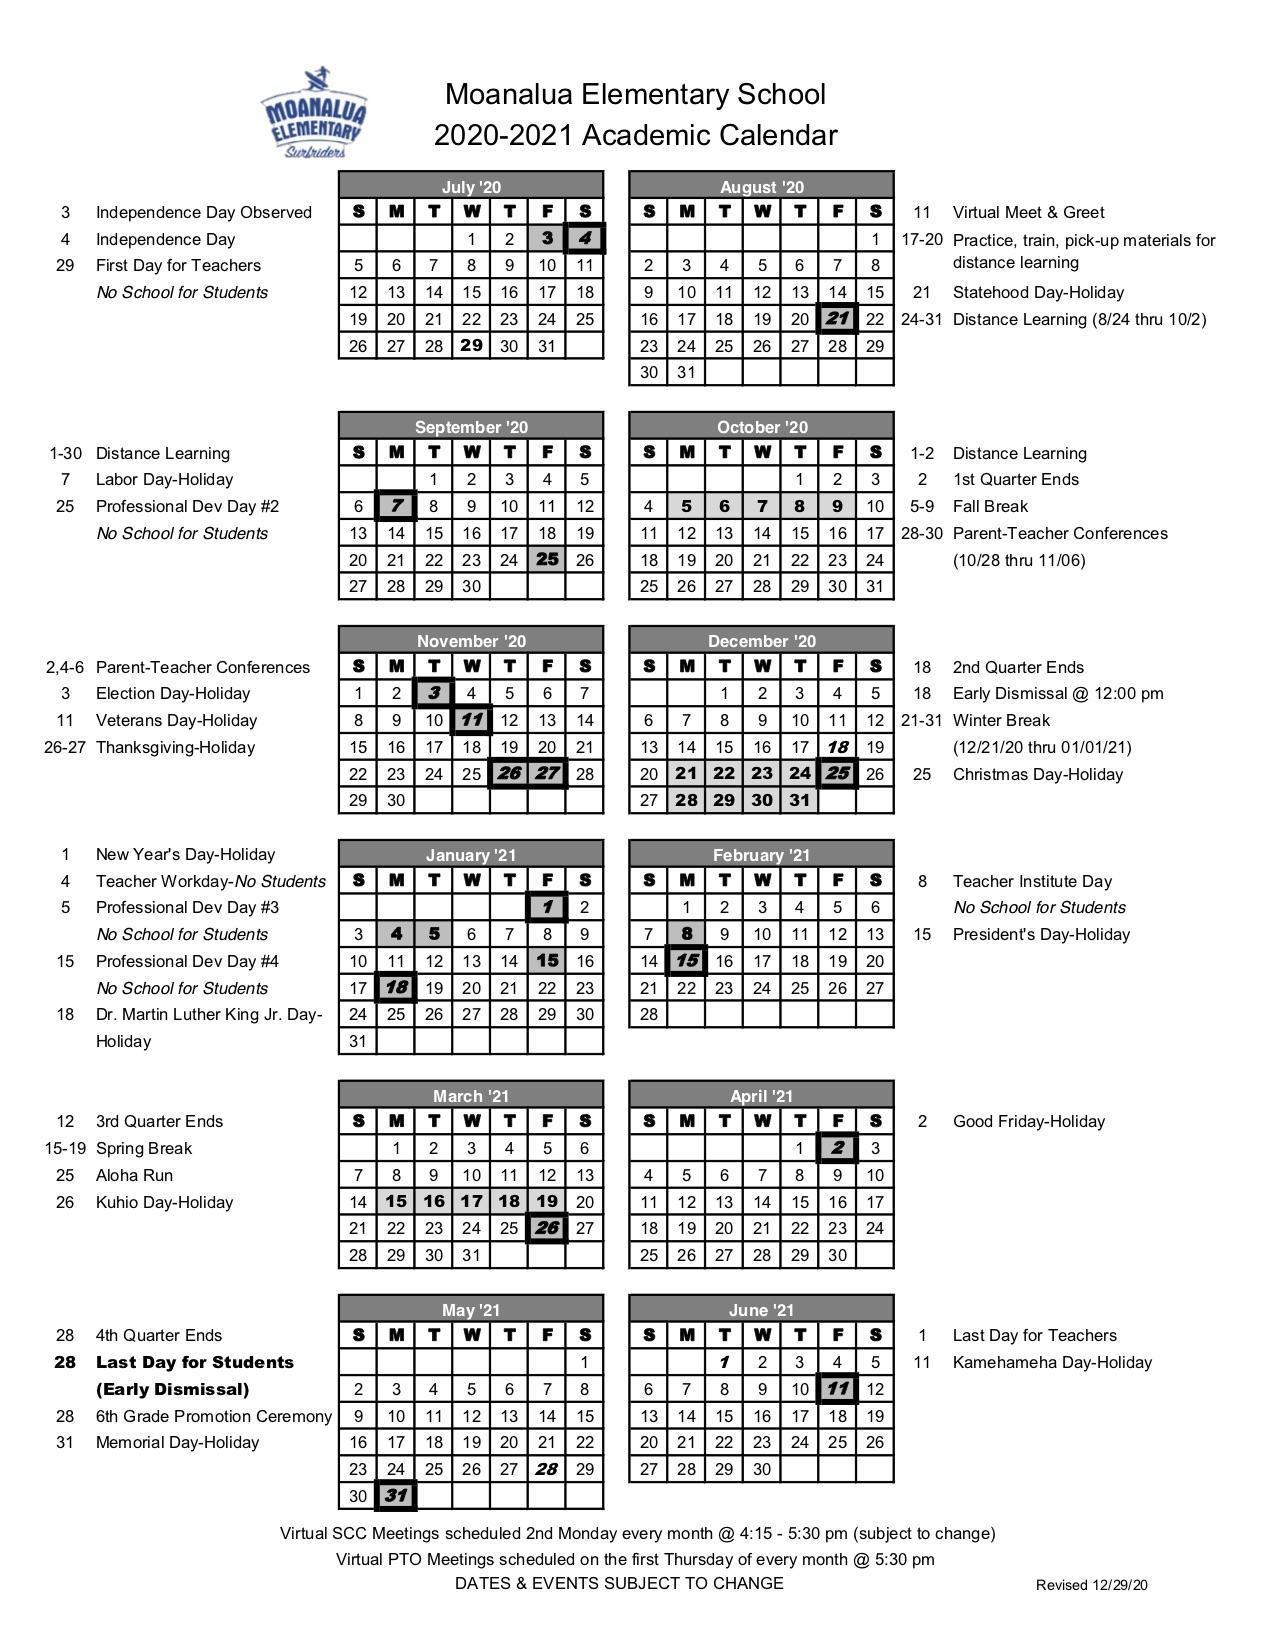 Academic Calendar 2020-2021